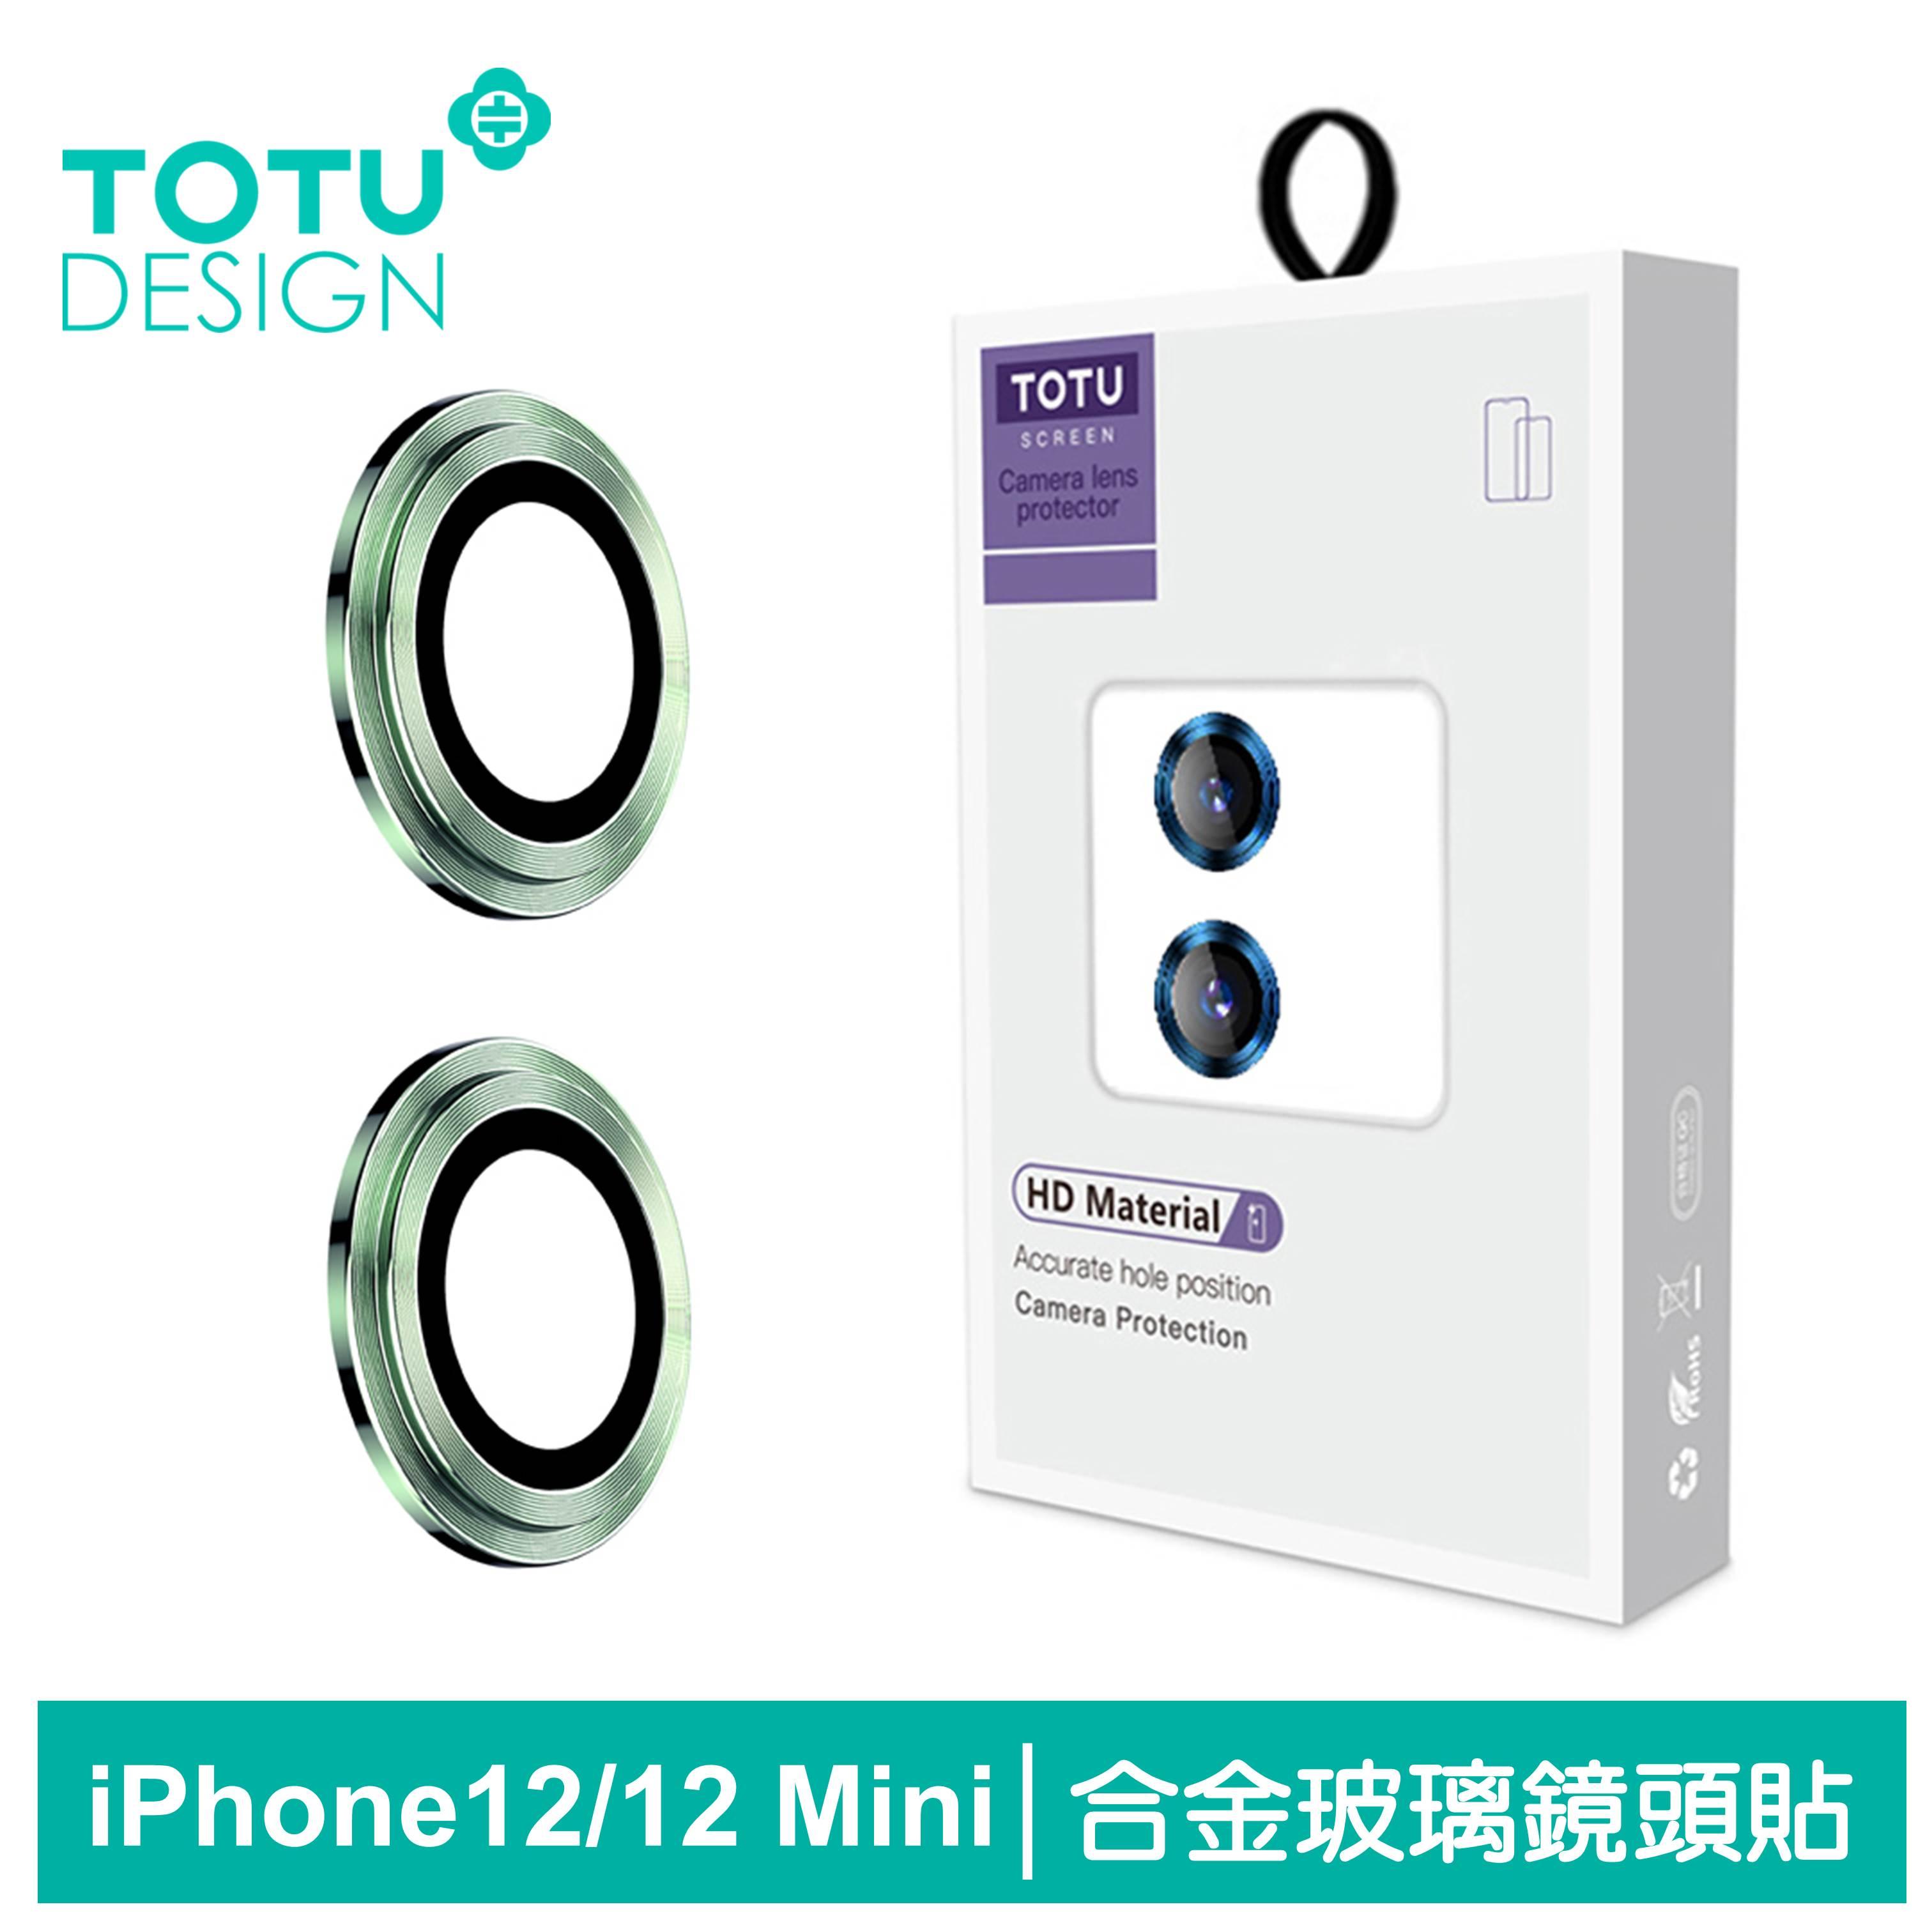 TOTU台灣官方 iPhone 12 /12 Mini 鏡頭貼 i12 Mini 鋼化膜 保護貼 鋁合金鋼化玻璃 金盾系列 綠色